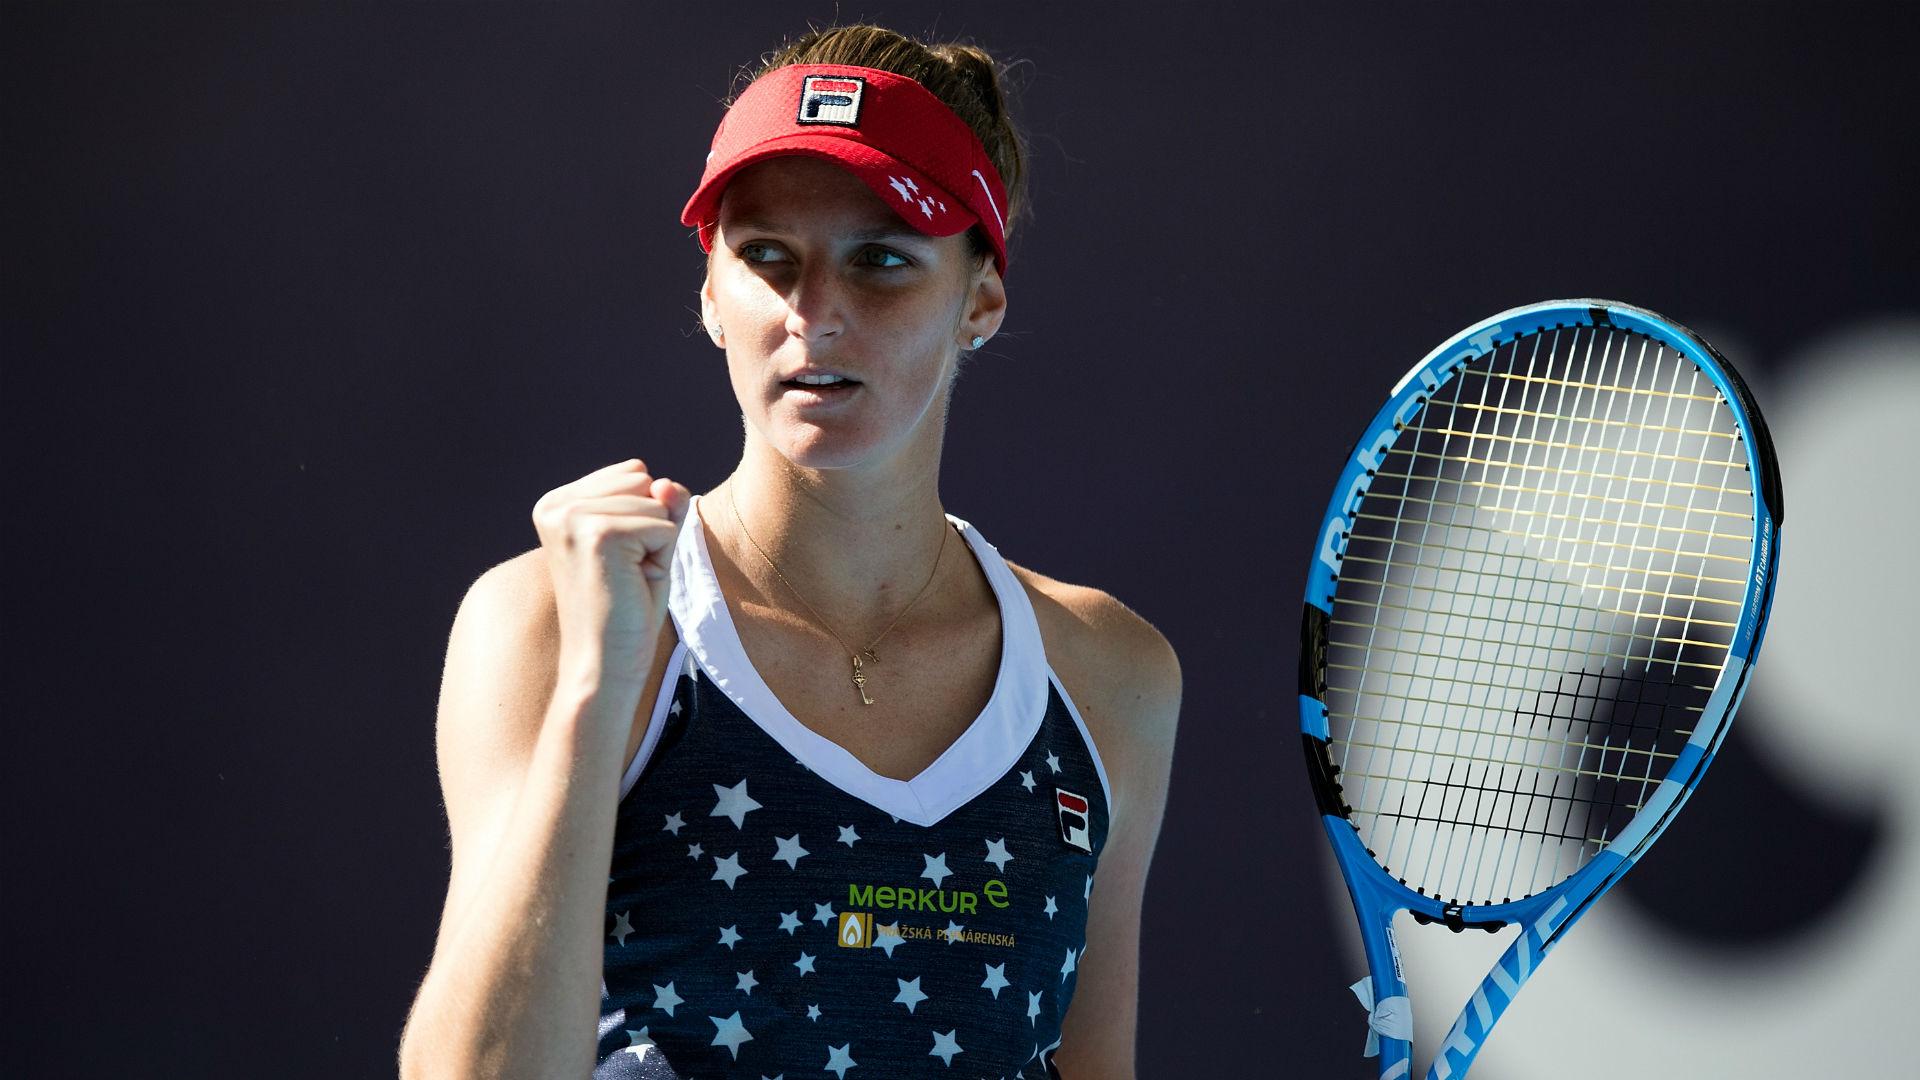 Pliskova qualifies for WTA Finals